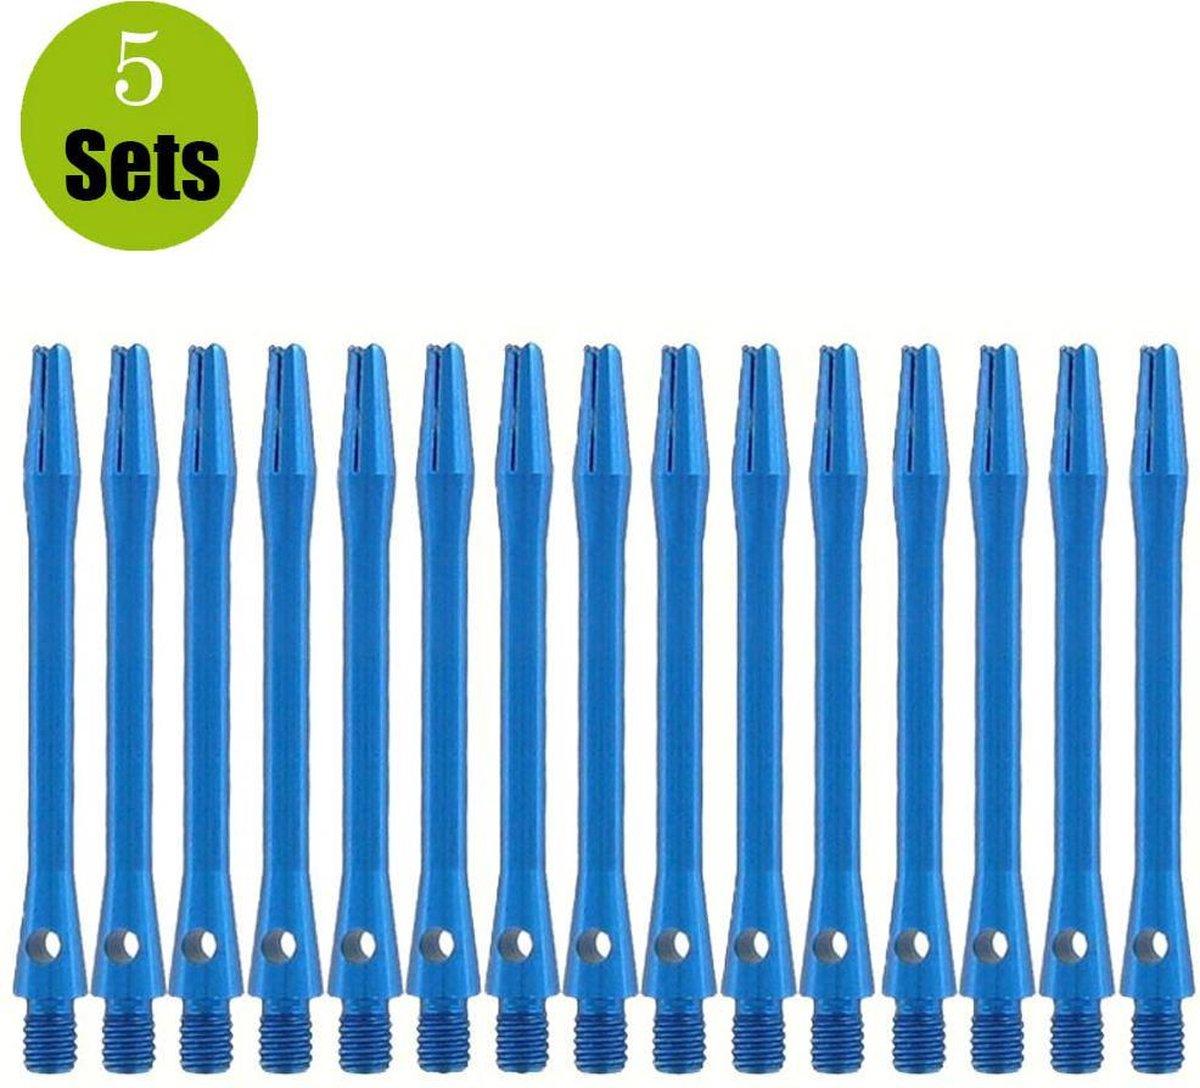 Bulls Aluminium 5sets DartShafts - Blauw - Medium - (5 Sets)